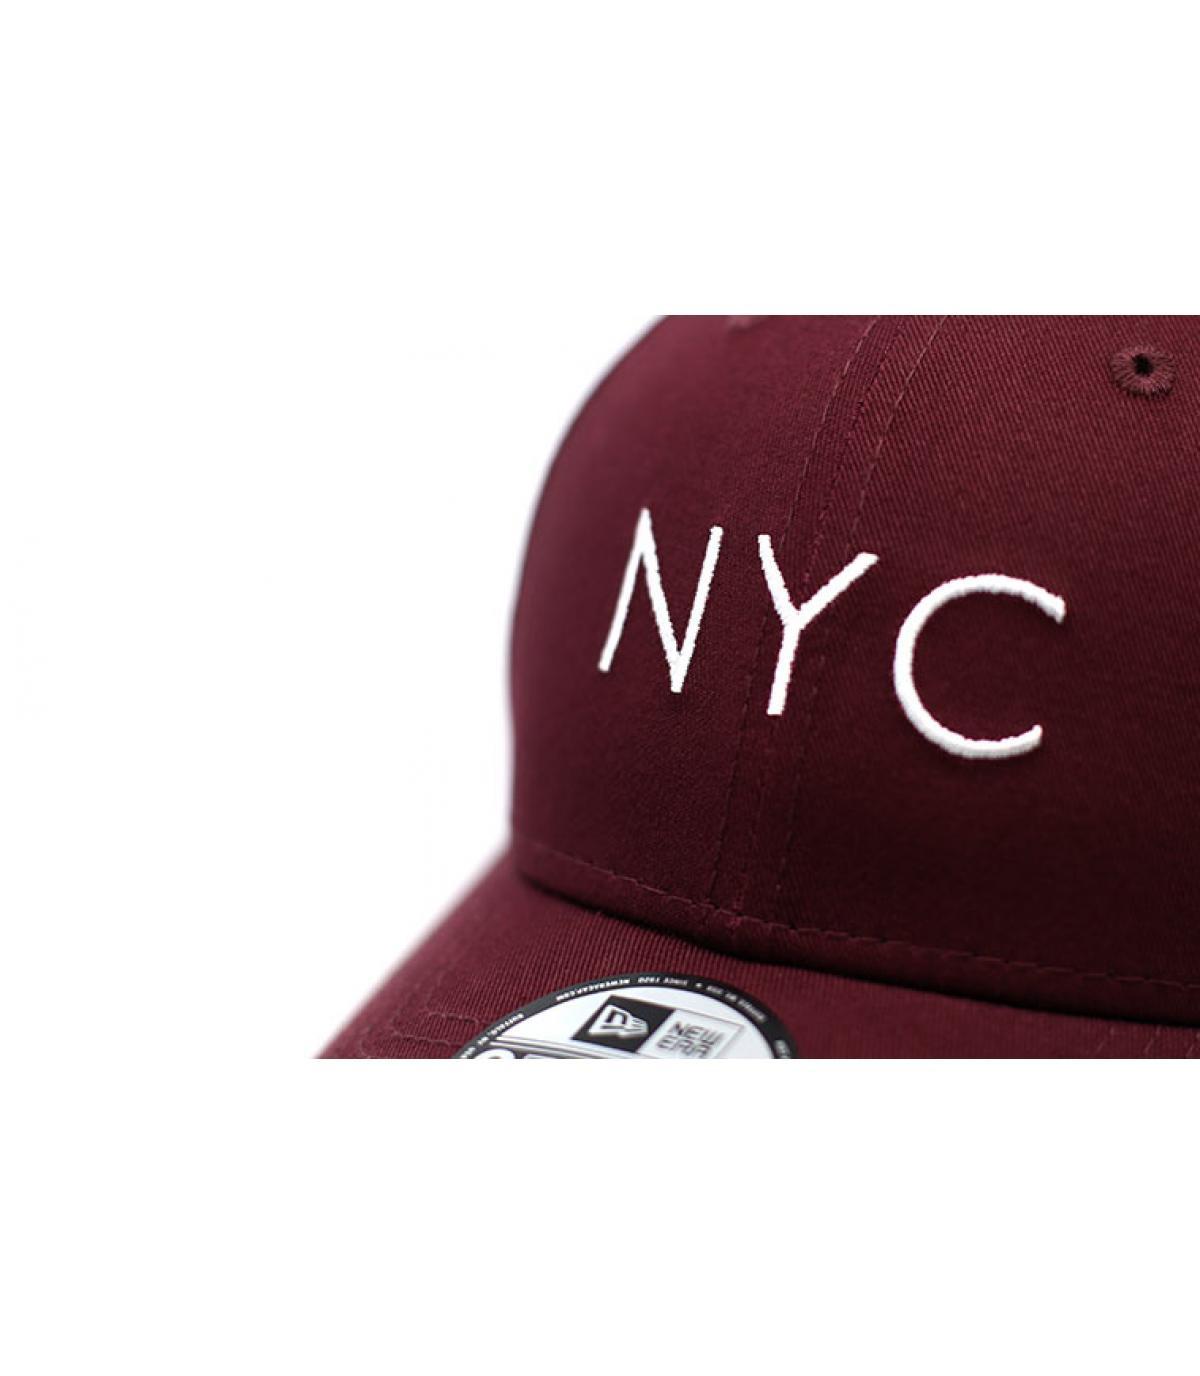 Details Cap NYC NE Ess 9Forty maroon - Abbildung 3